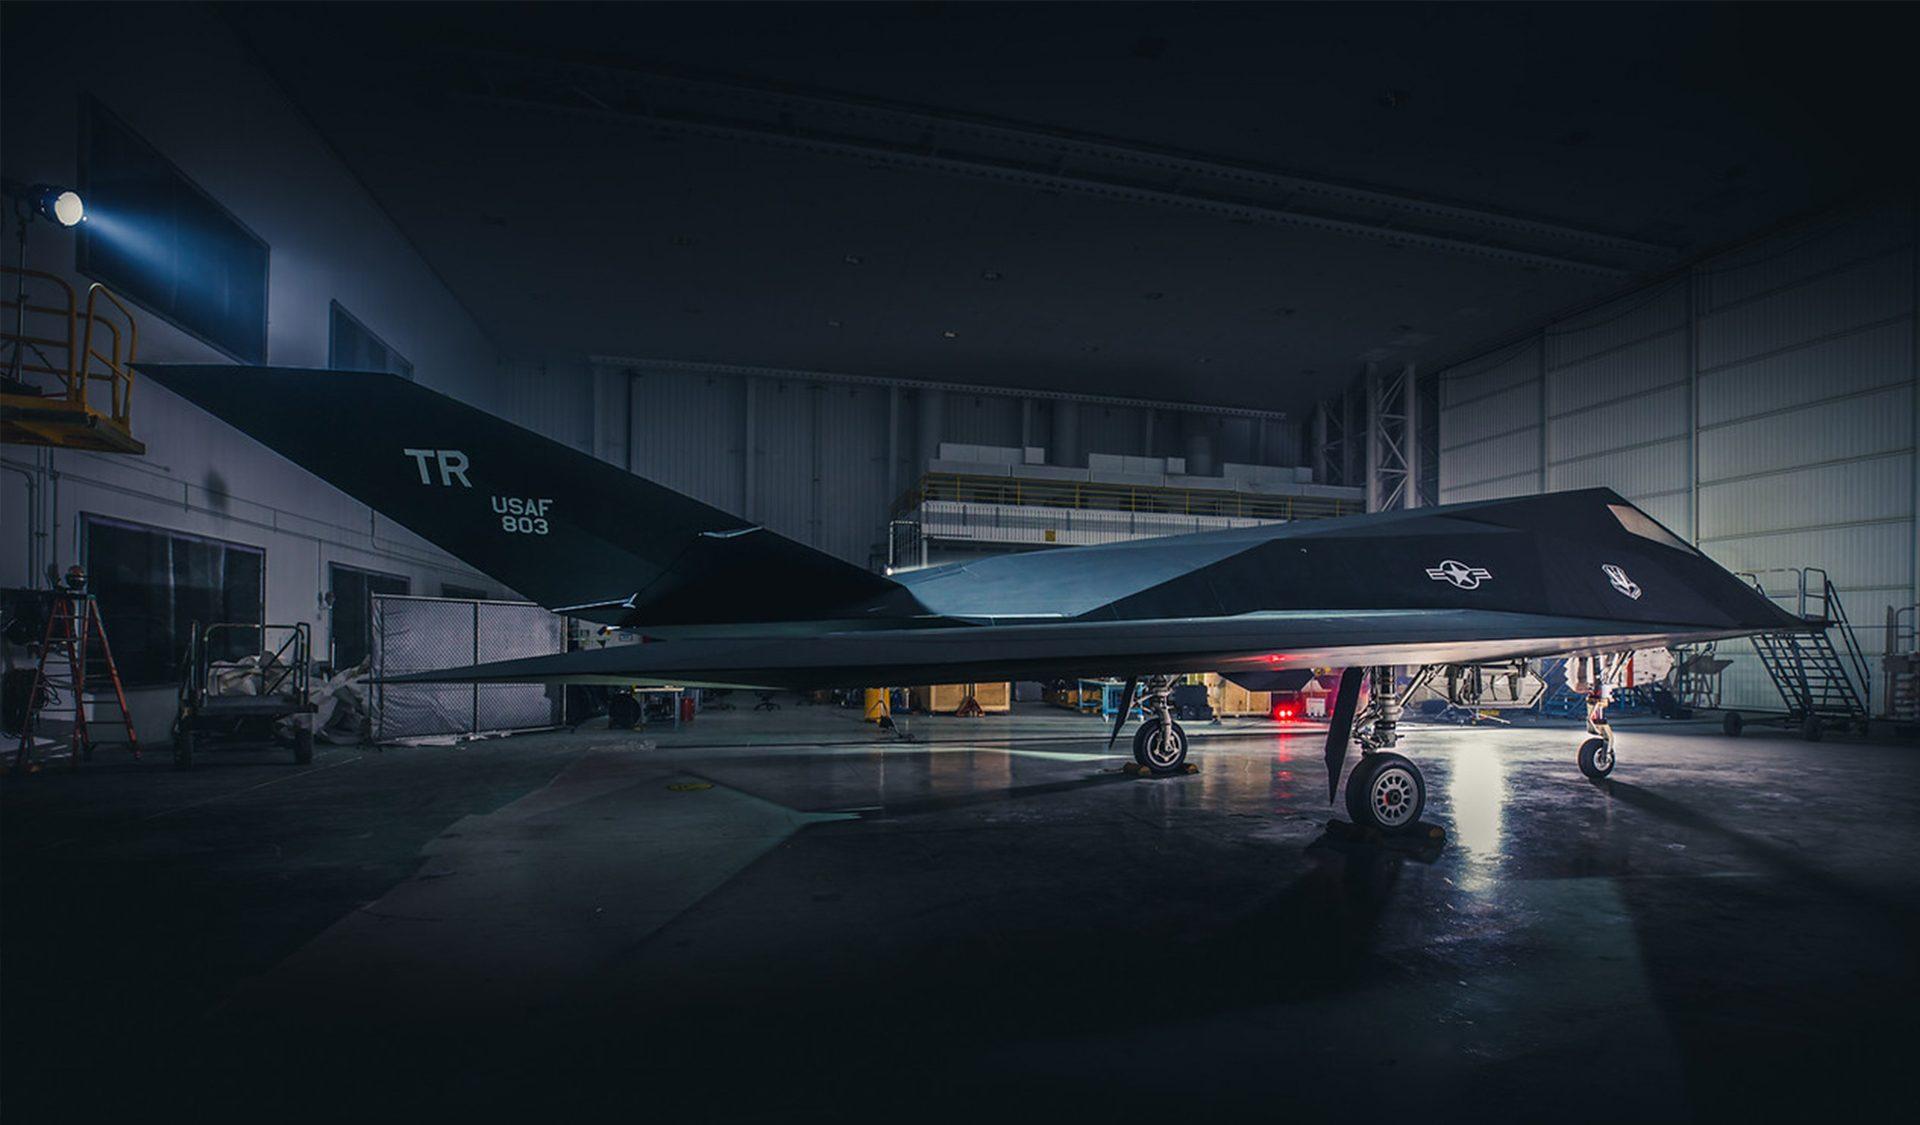 F-117: Η θρυλική κατάρριψη του ιστορικού stealth αεροσκάφους Nighthawk από τους Σέρβους! [pics]